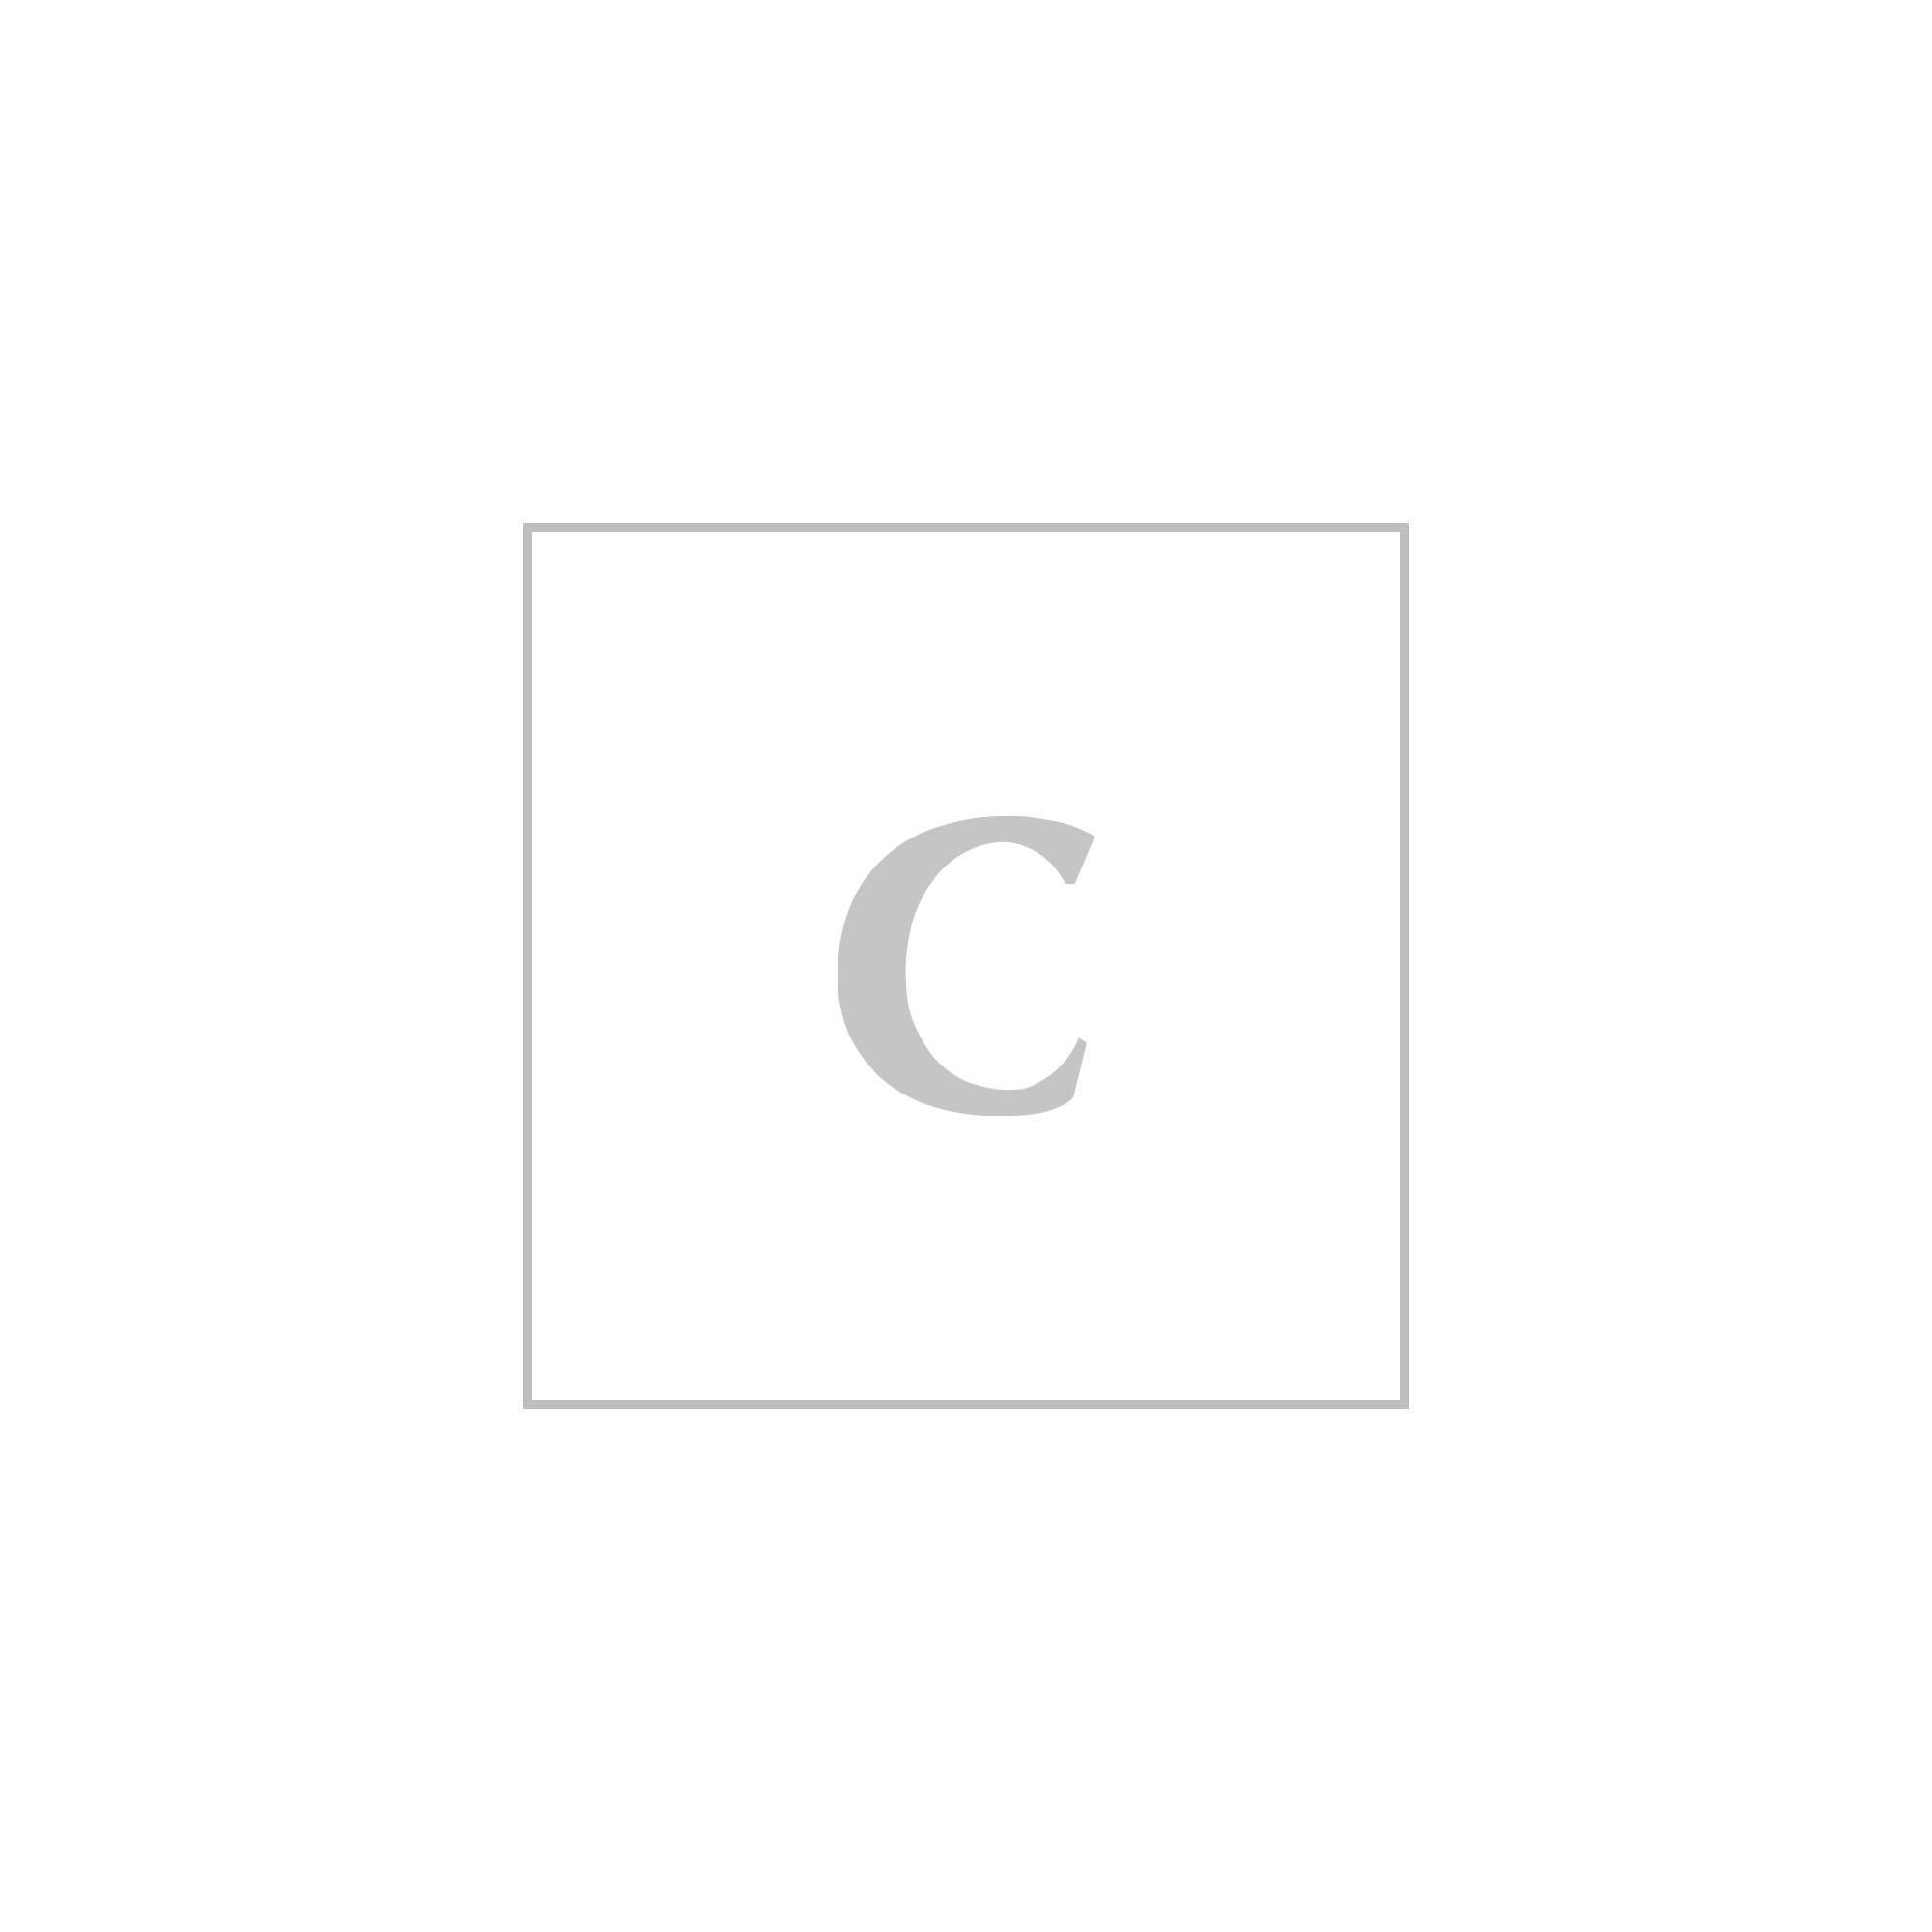 Fendi elite calfskin continental wallet